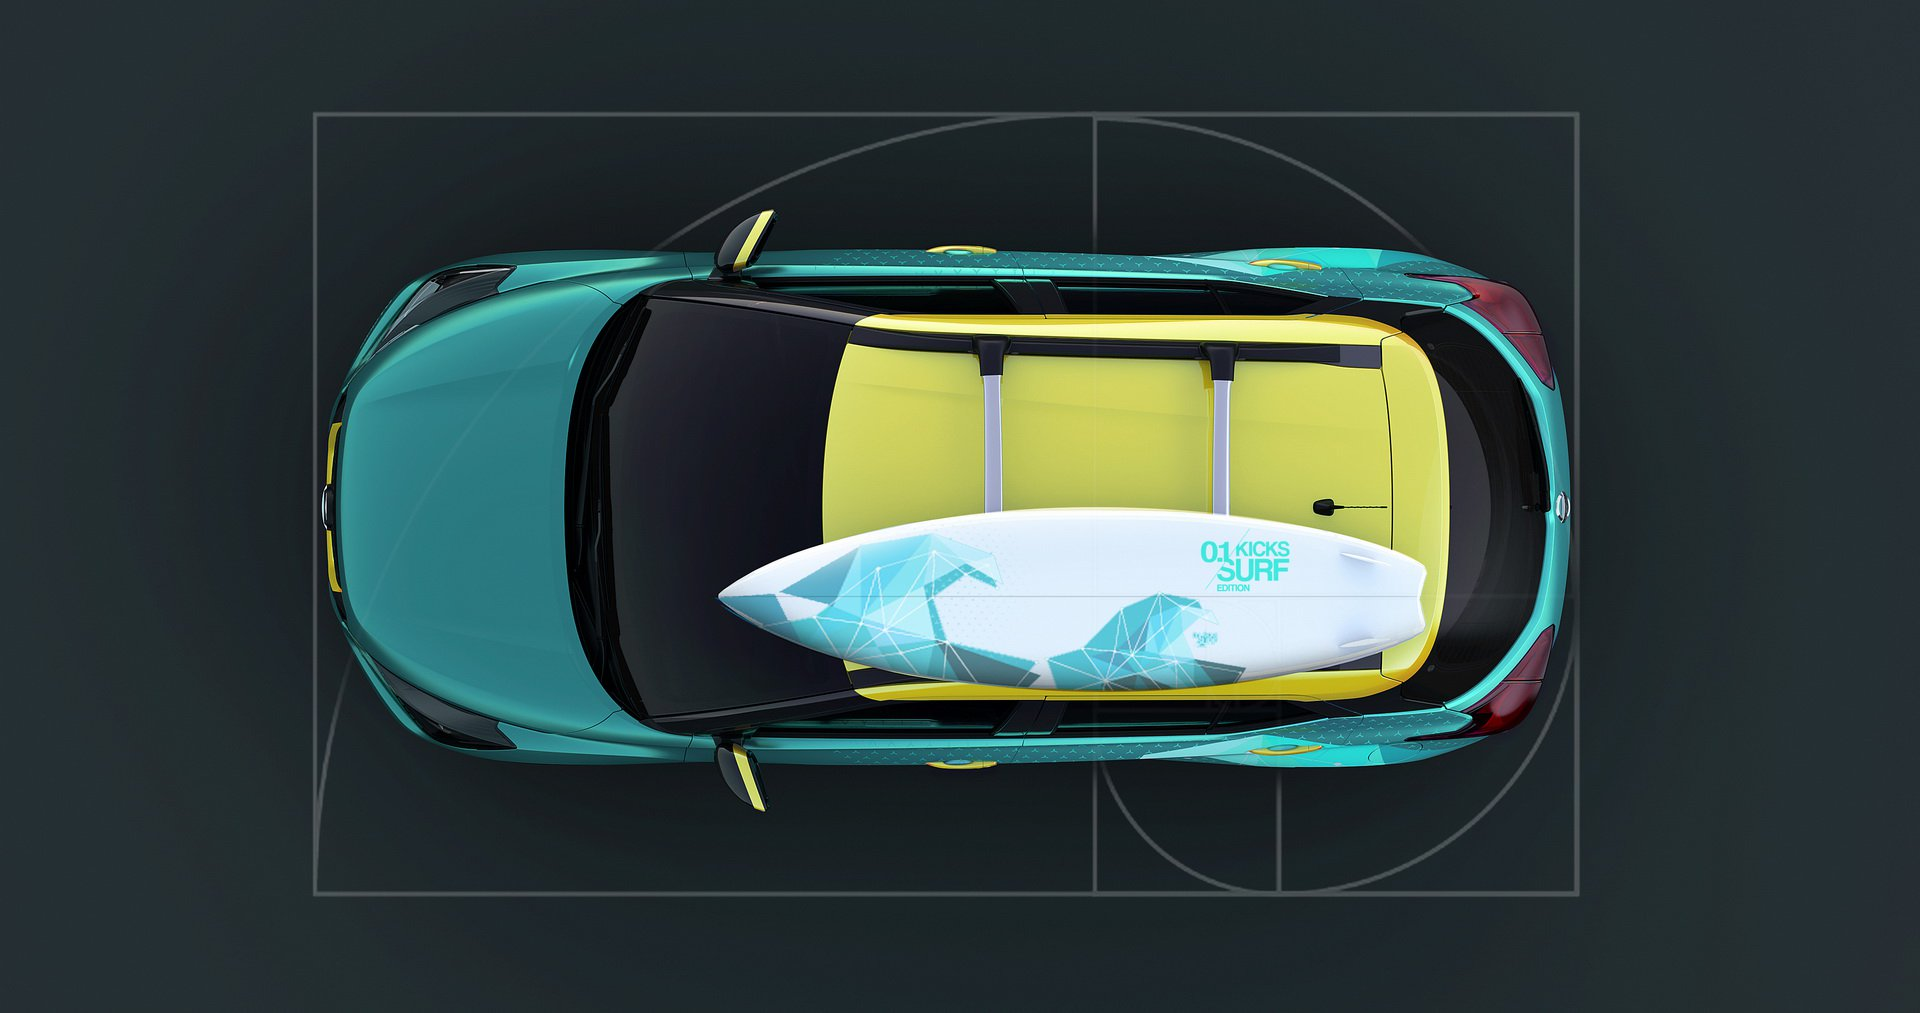 Nissan Kicks Surf Concept (7)